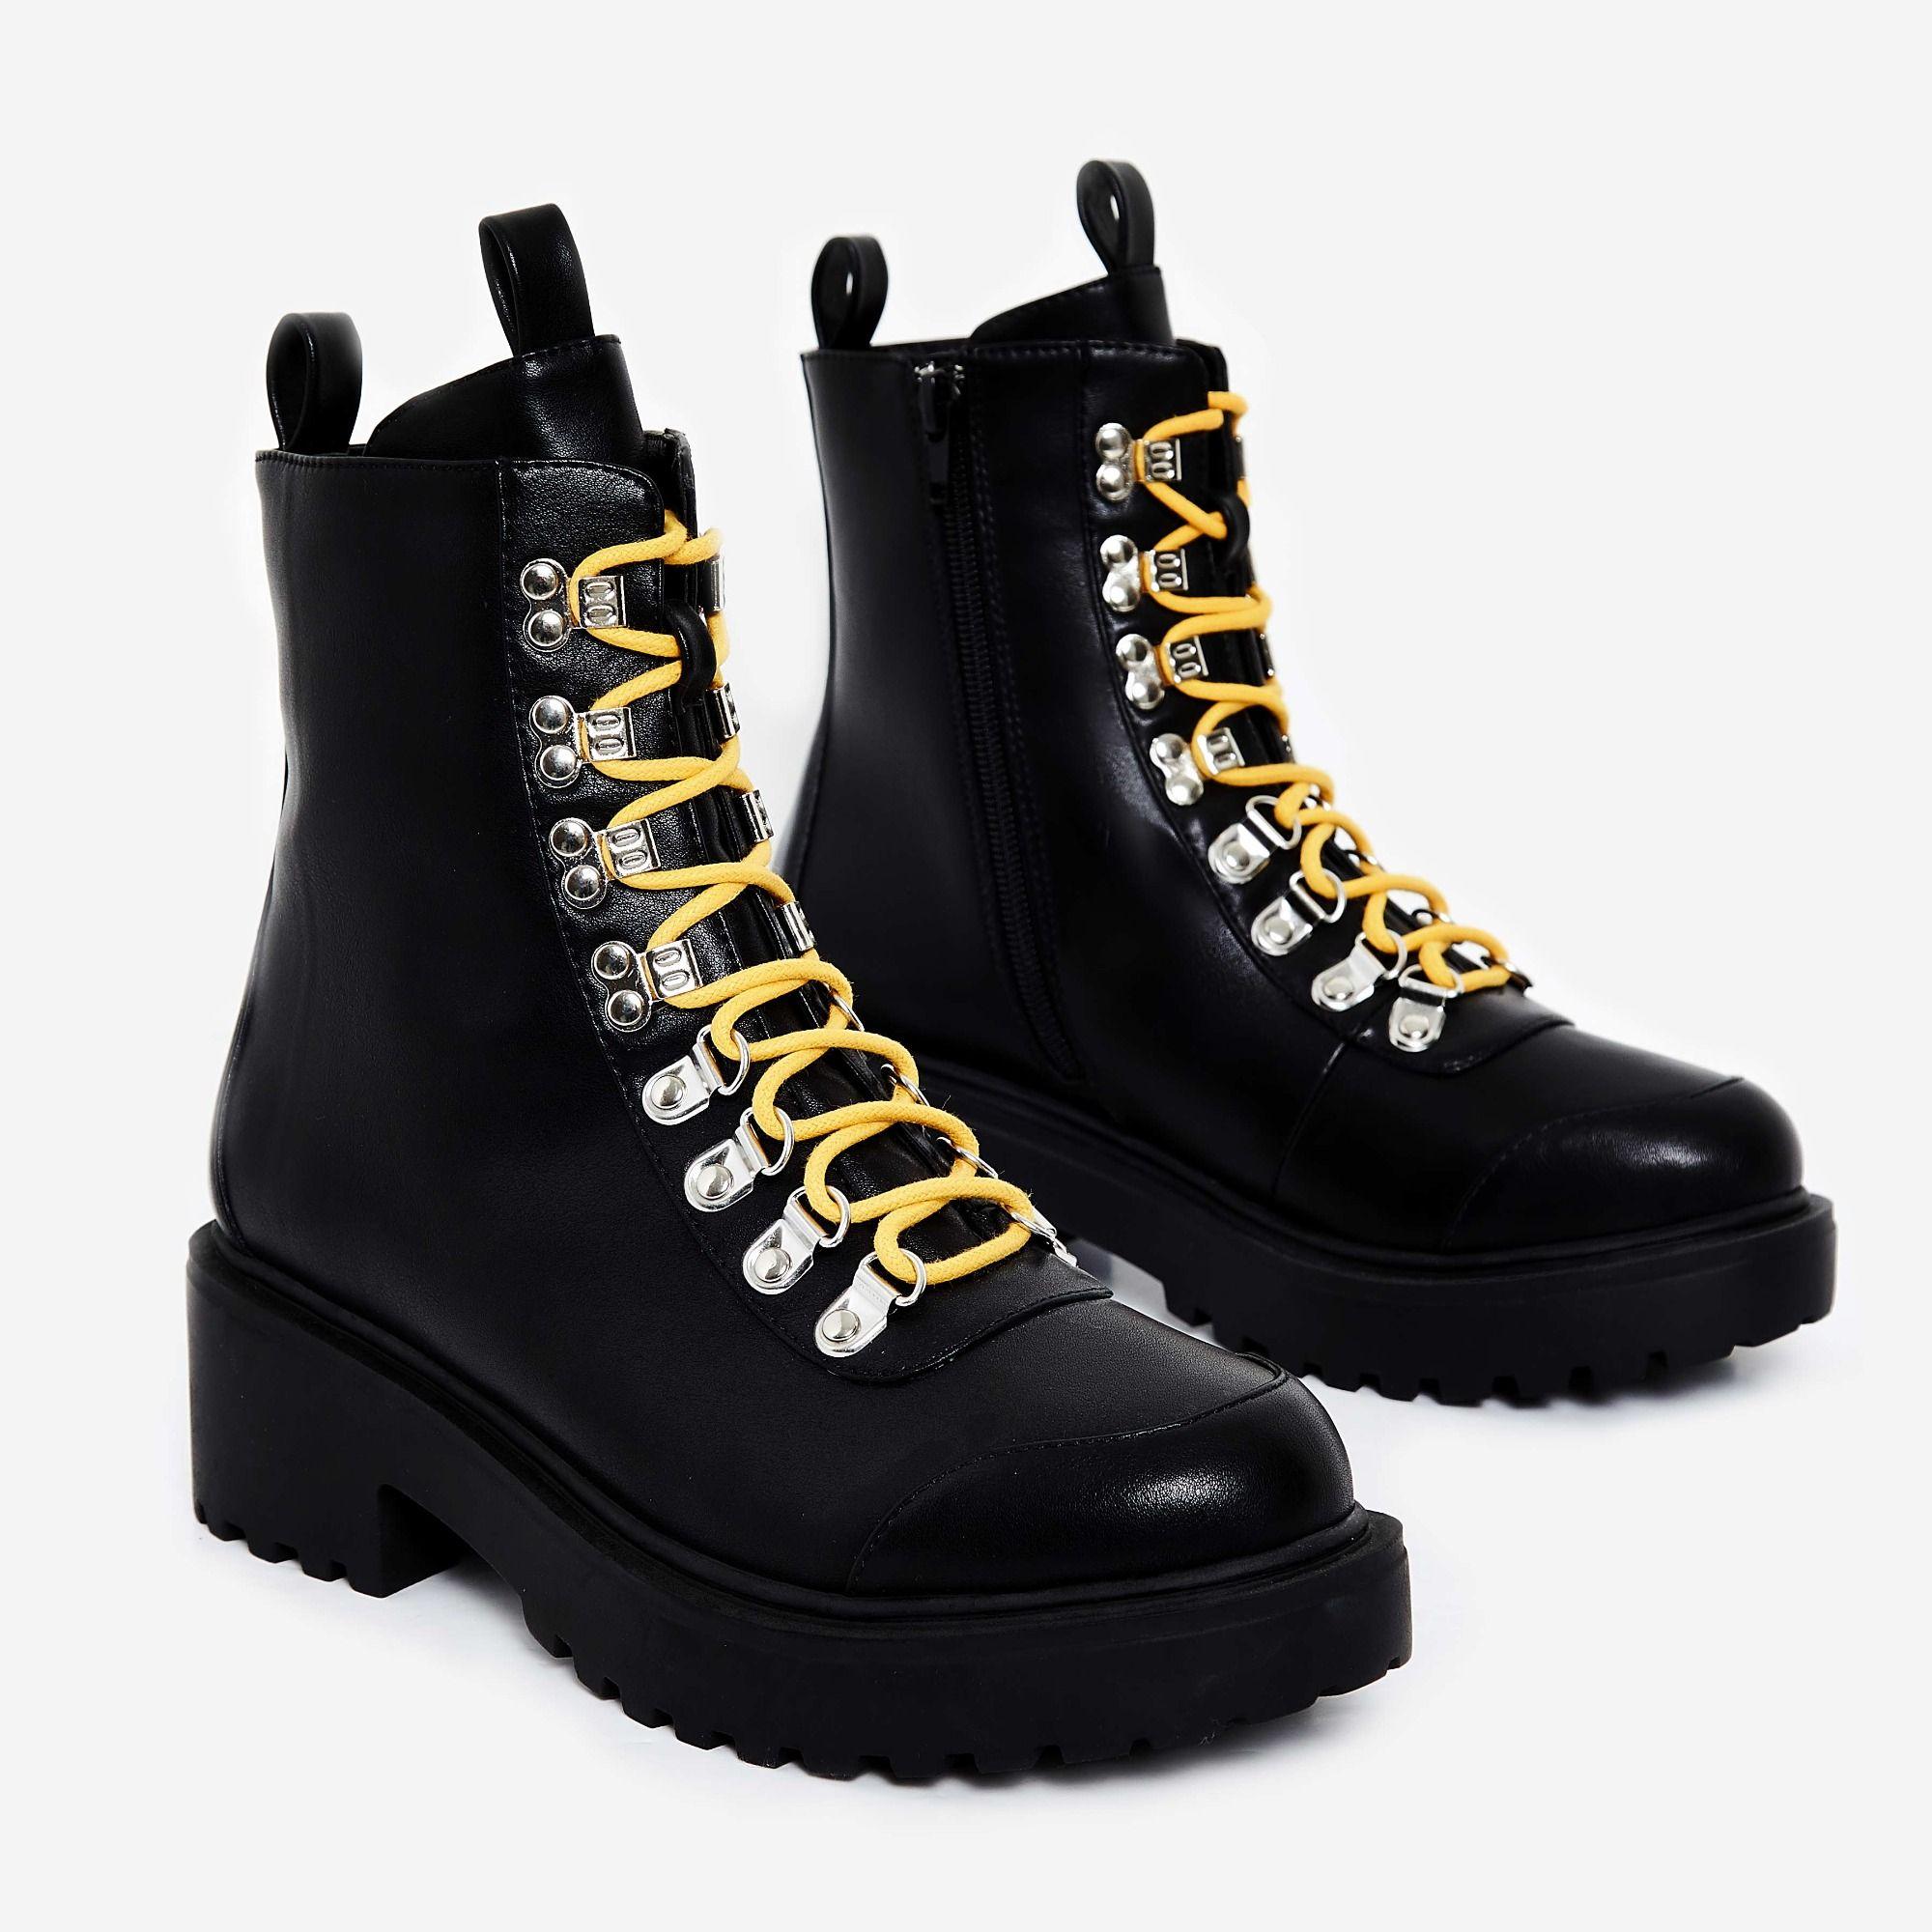 Ego Biker boots